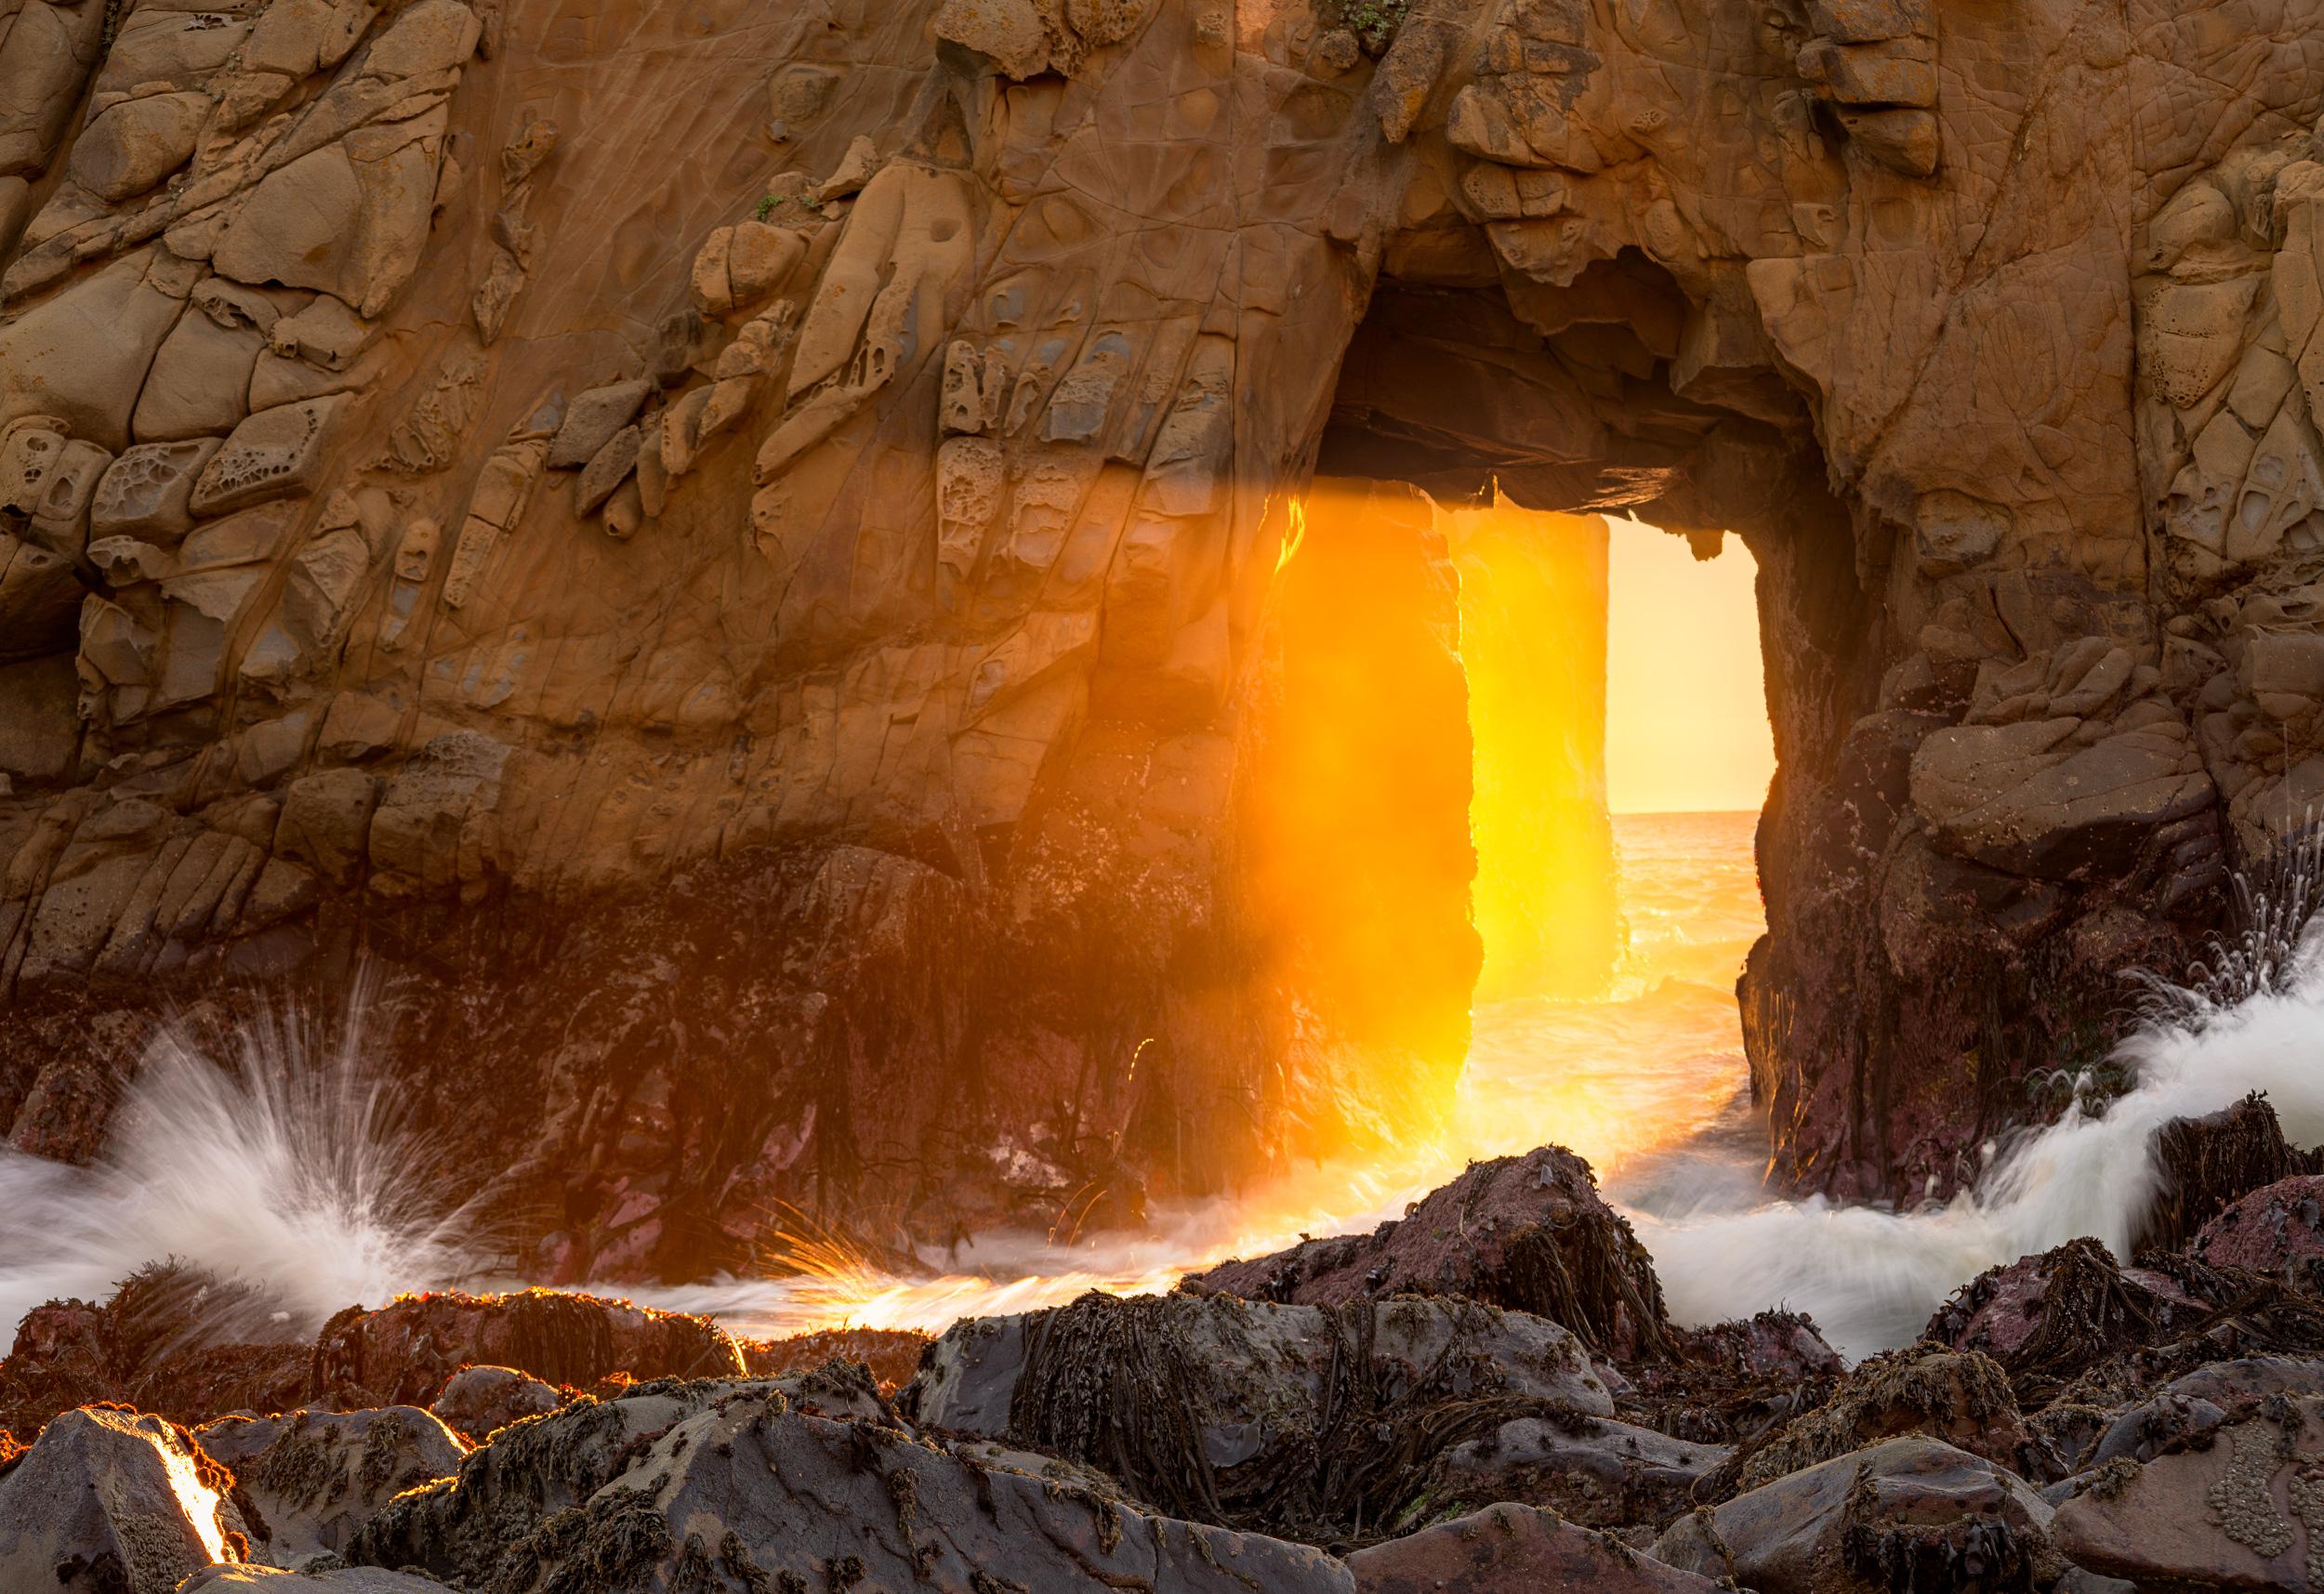 Sunset through the Keyhole, at Pfeiffer Beach.